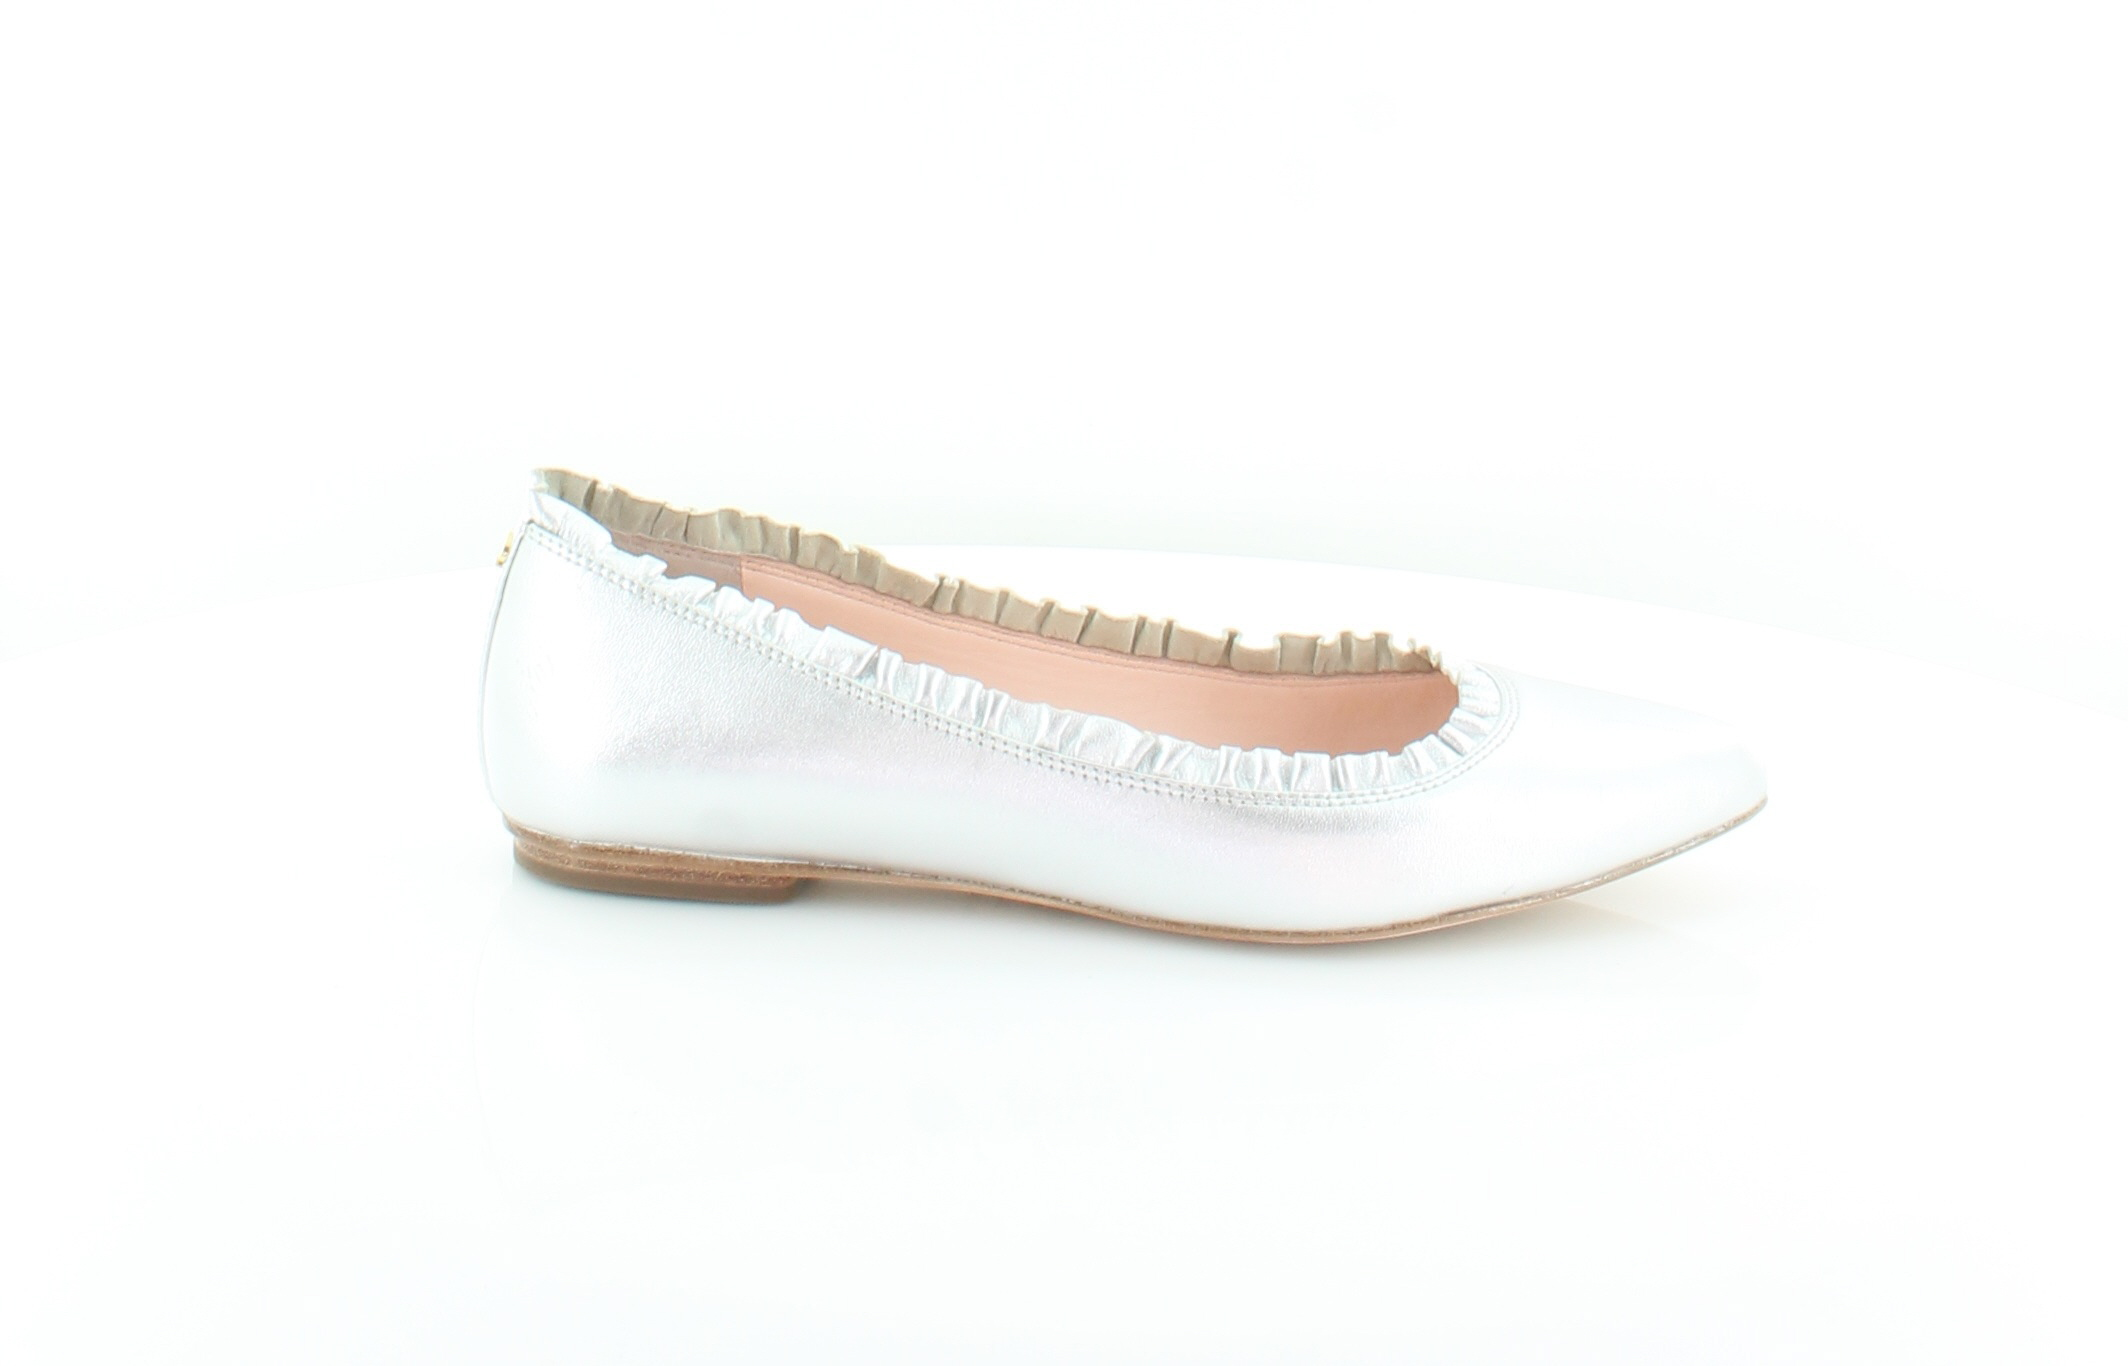 9a481a857c9a Image is loading kate spade nicole silver womens shoes size jpg 2128x1366 Kate  spade shoes flats